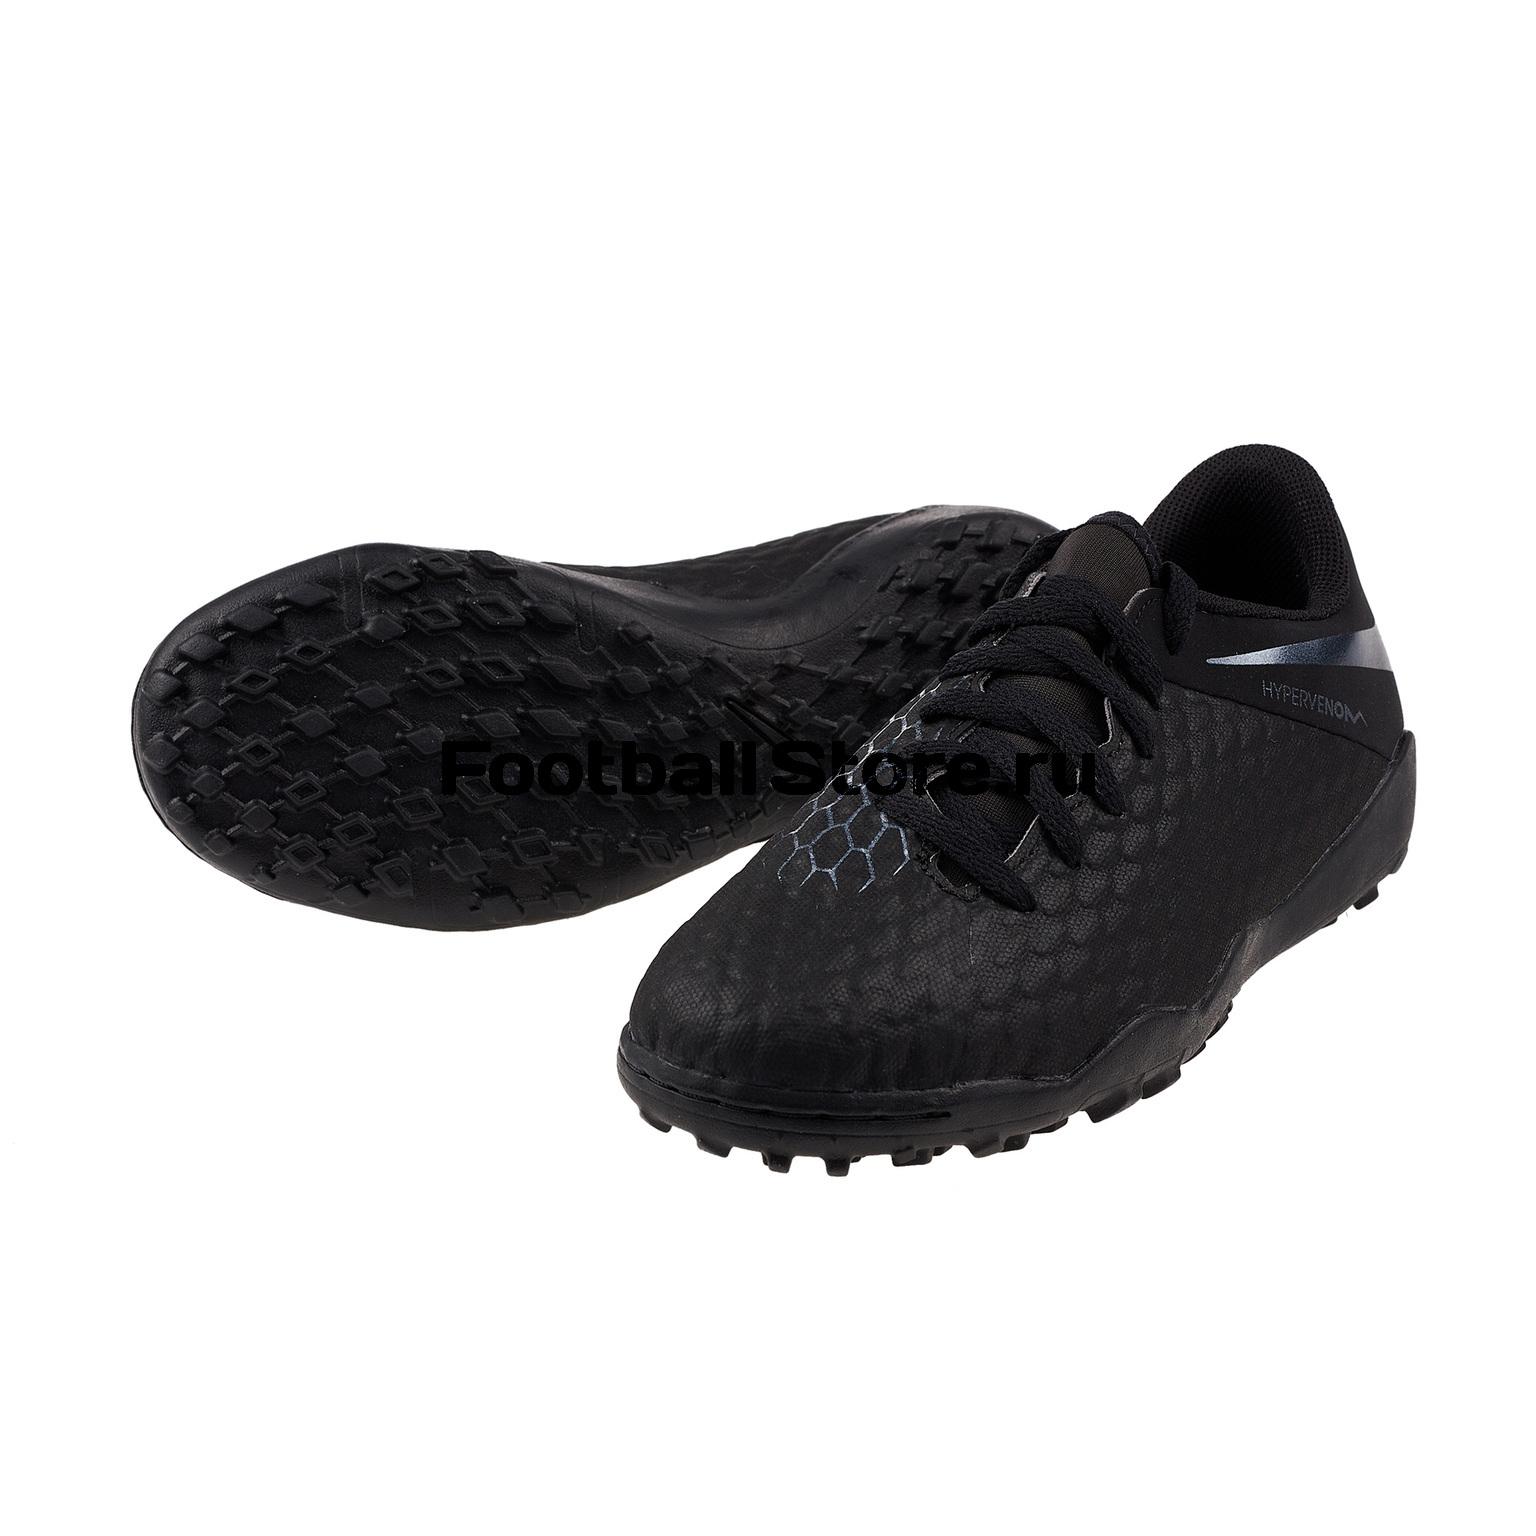 Шиповки детские Nike Hypervenom 3 Academy TF AJ3797-001 цена